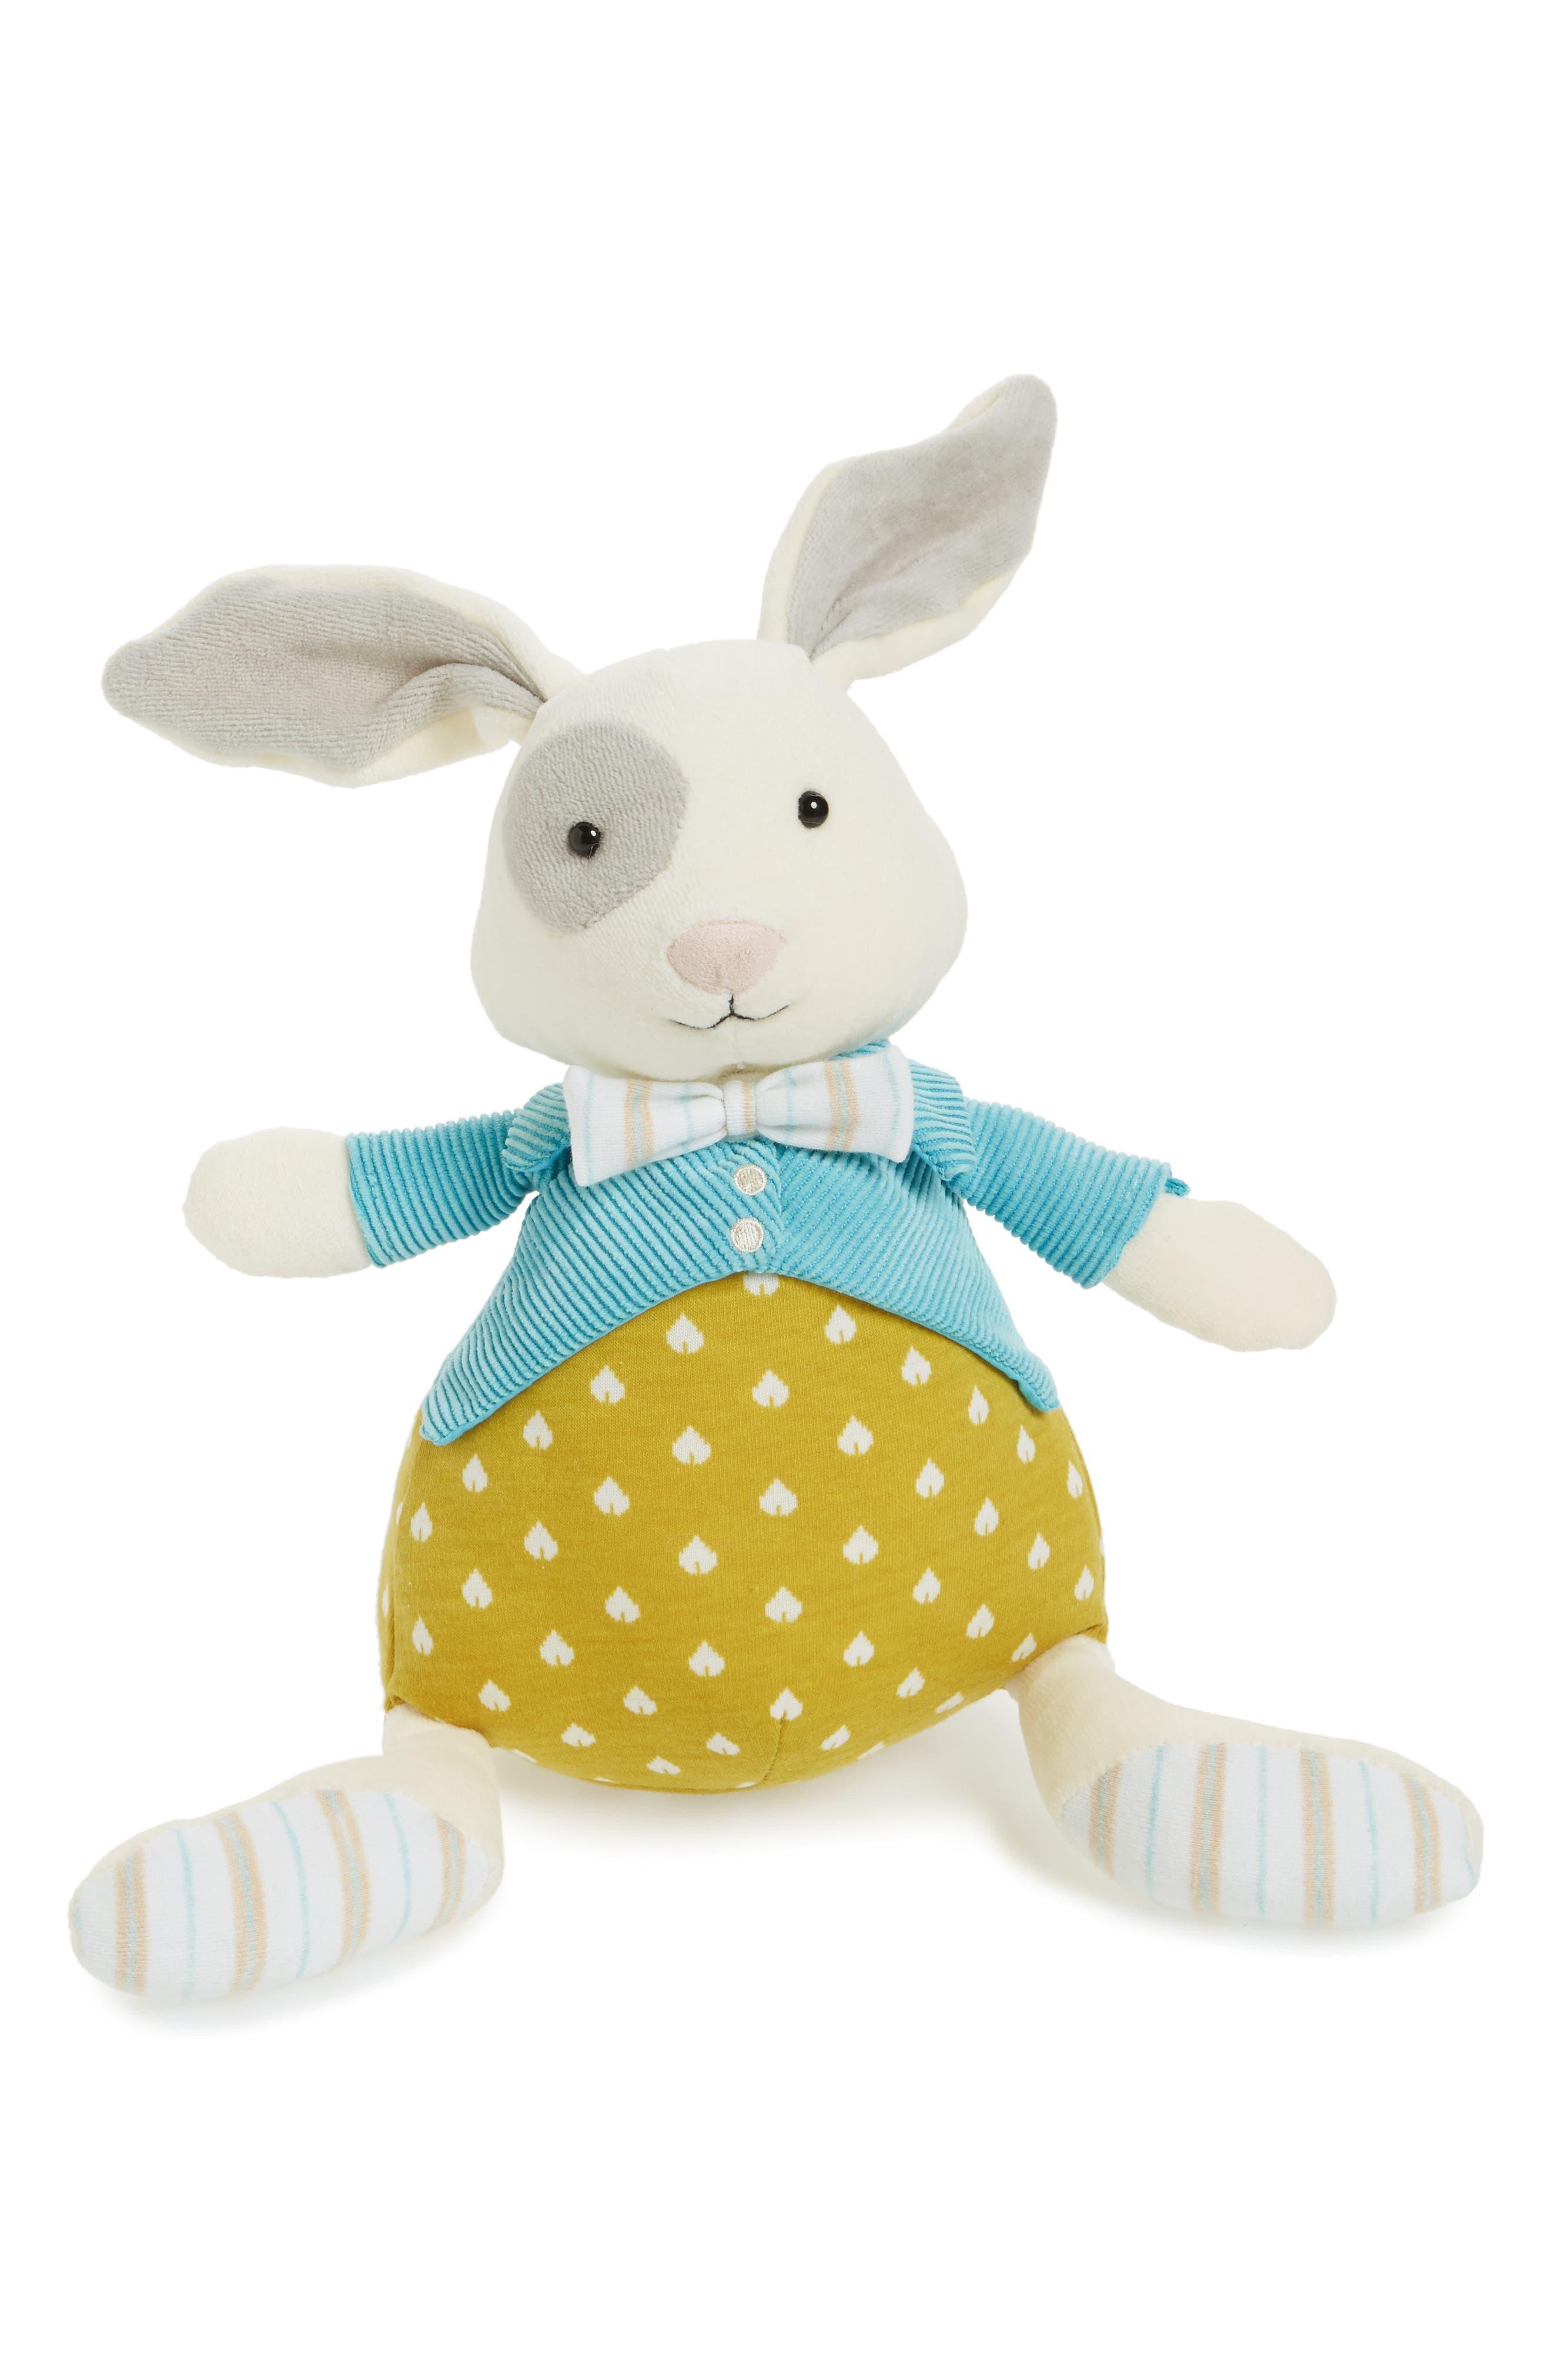 Lewis Rabbit Stuffed Animal,                         Main,                         color, Multi